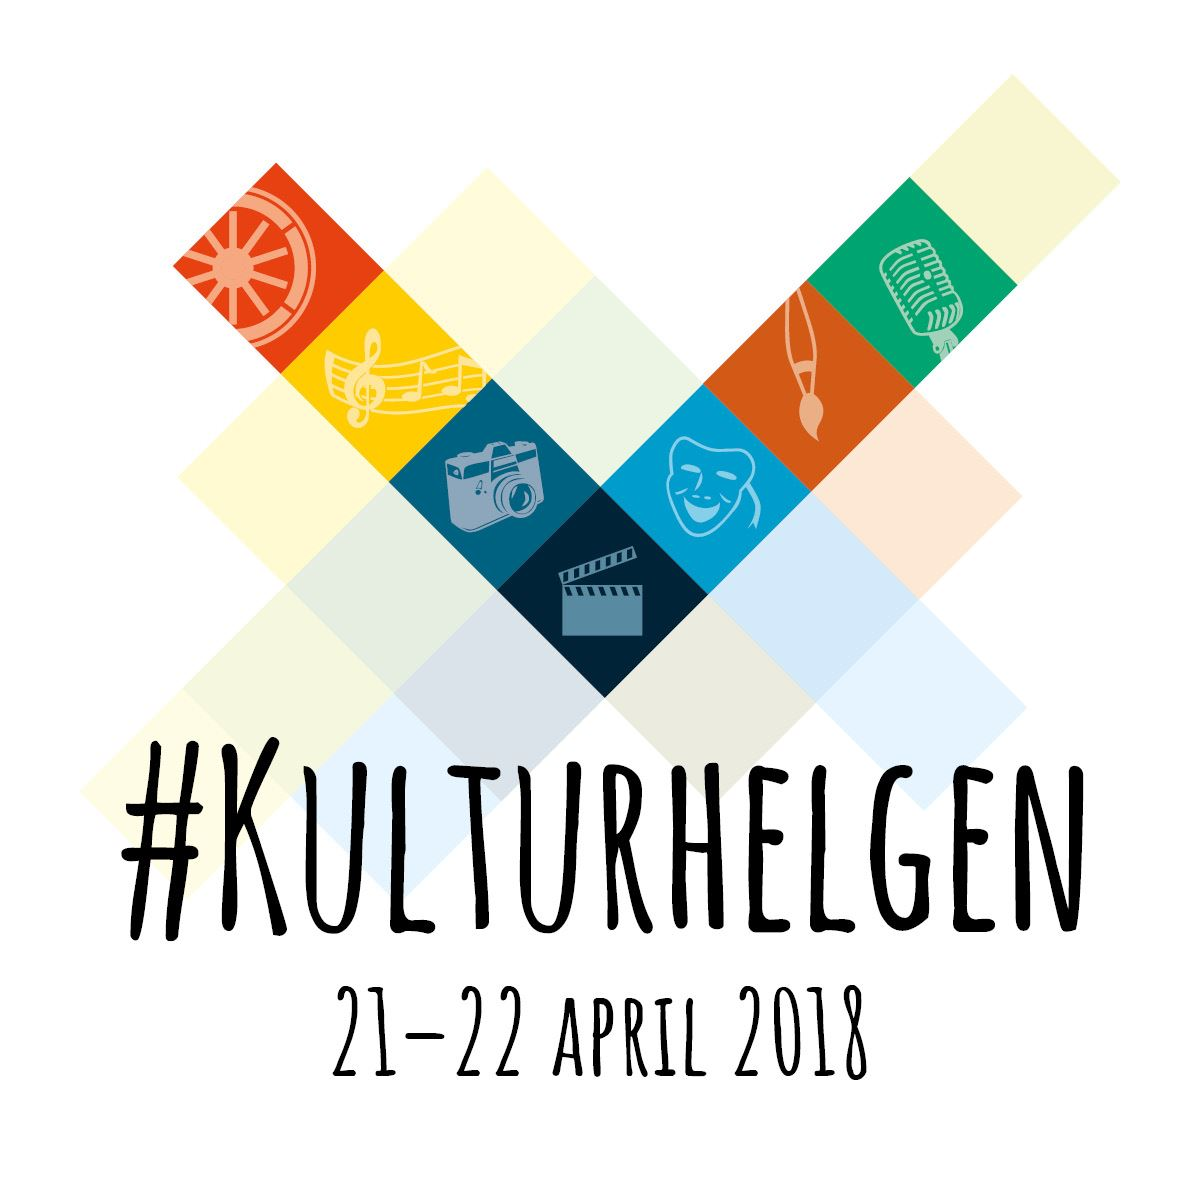 Kulturhelgen 2018